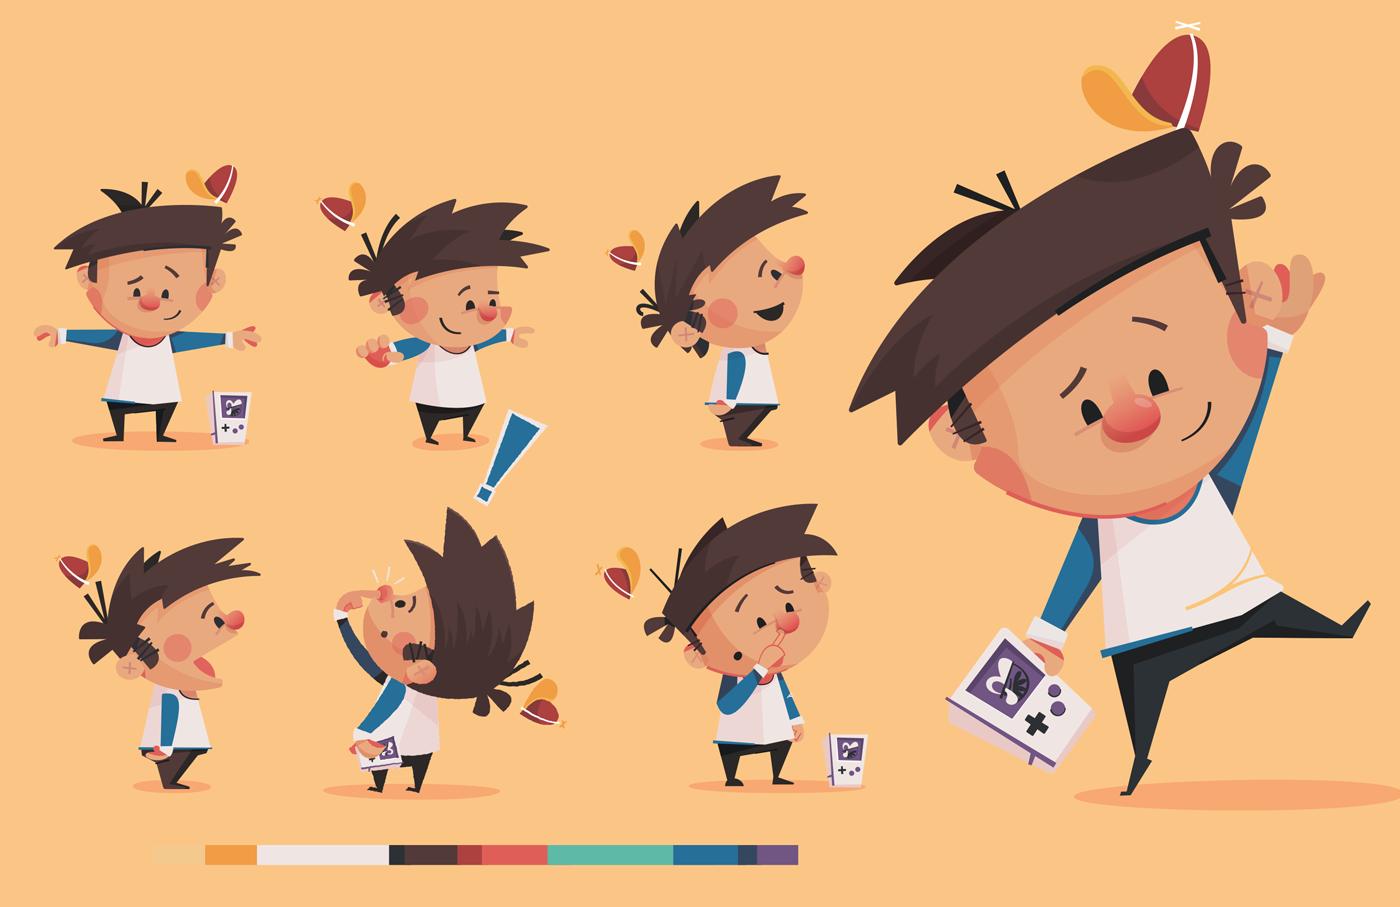 Children S Book Character Design : Children s book character design process on behance